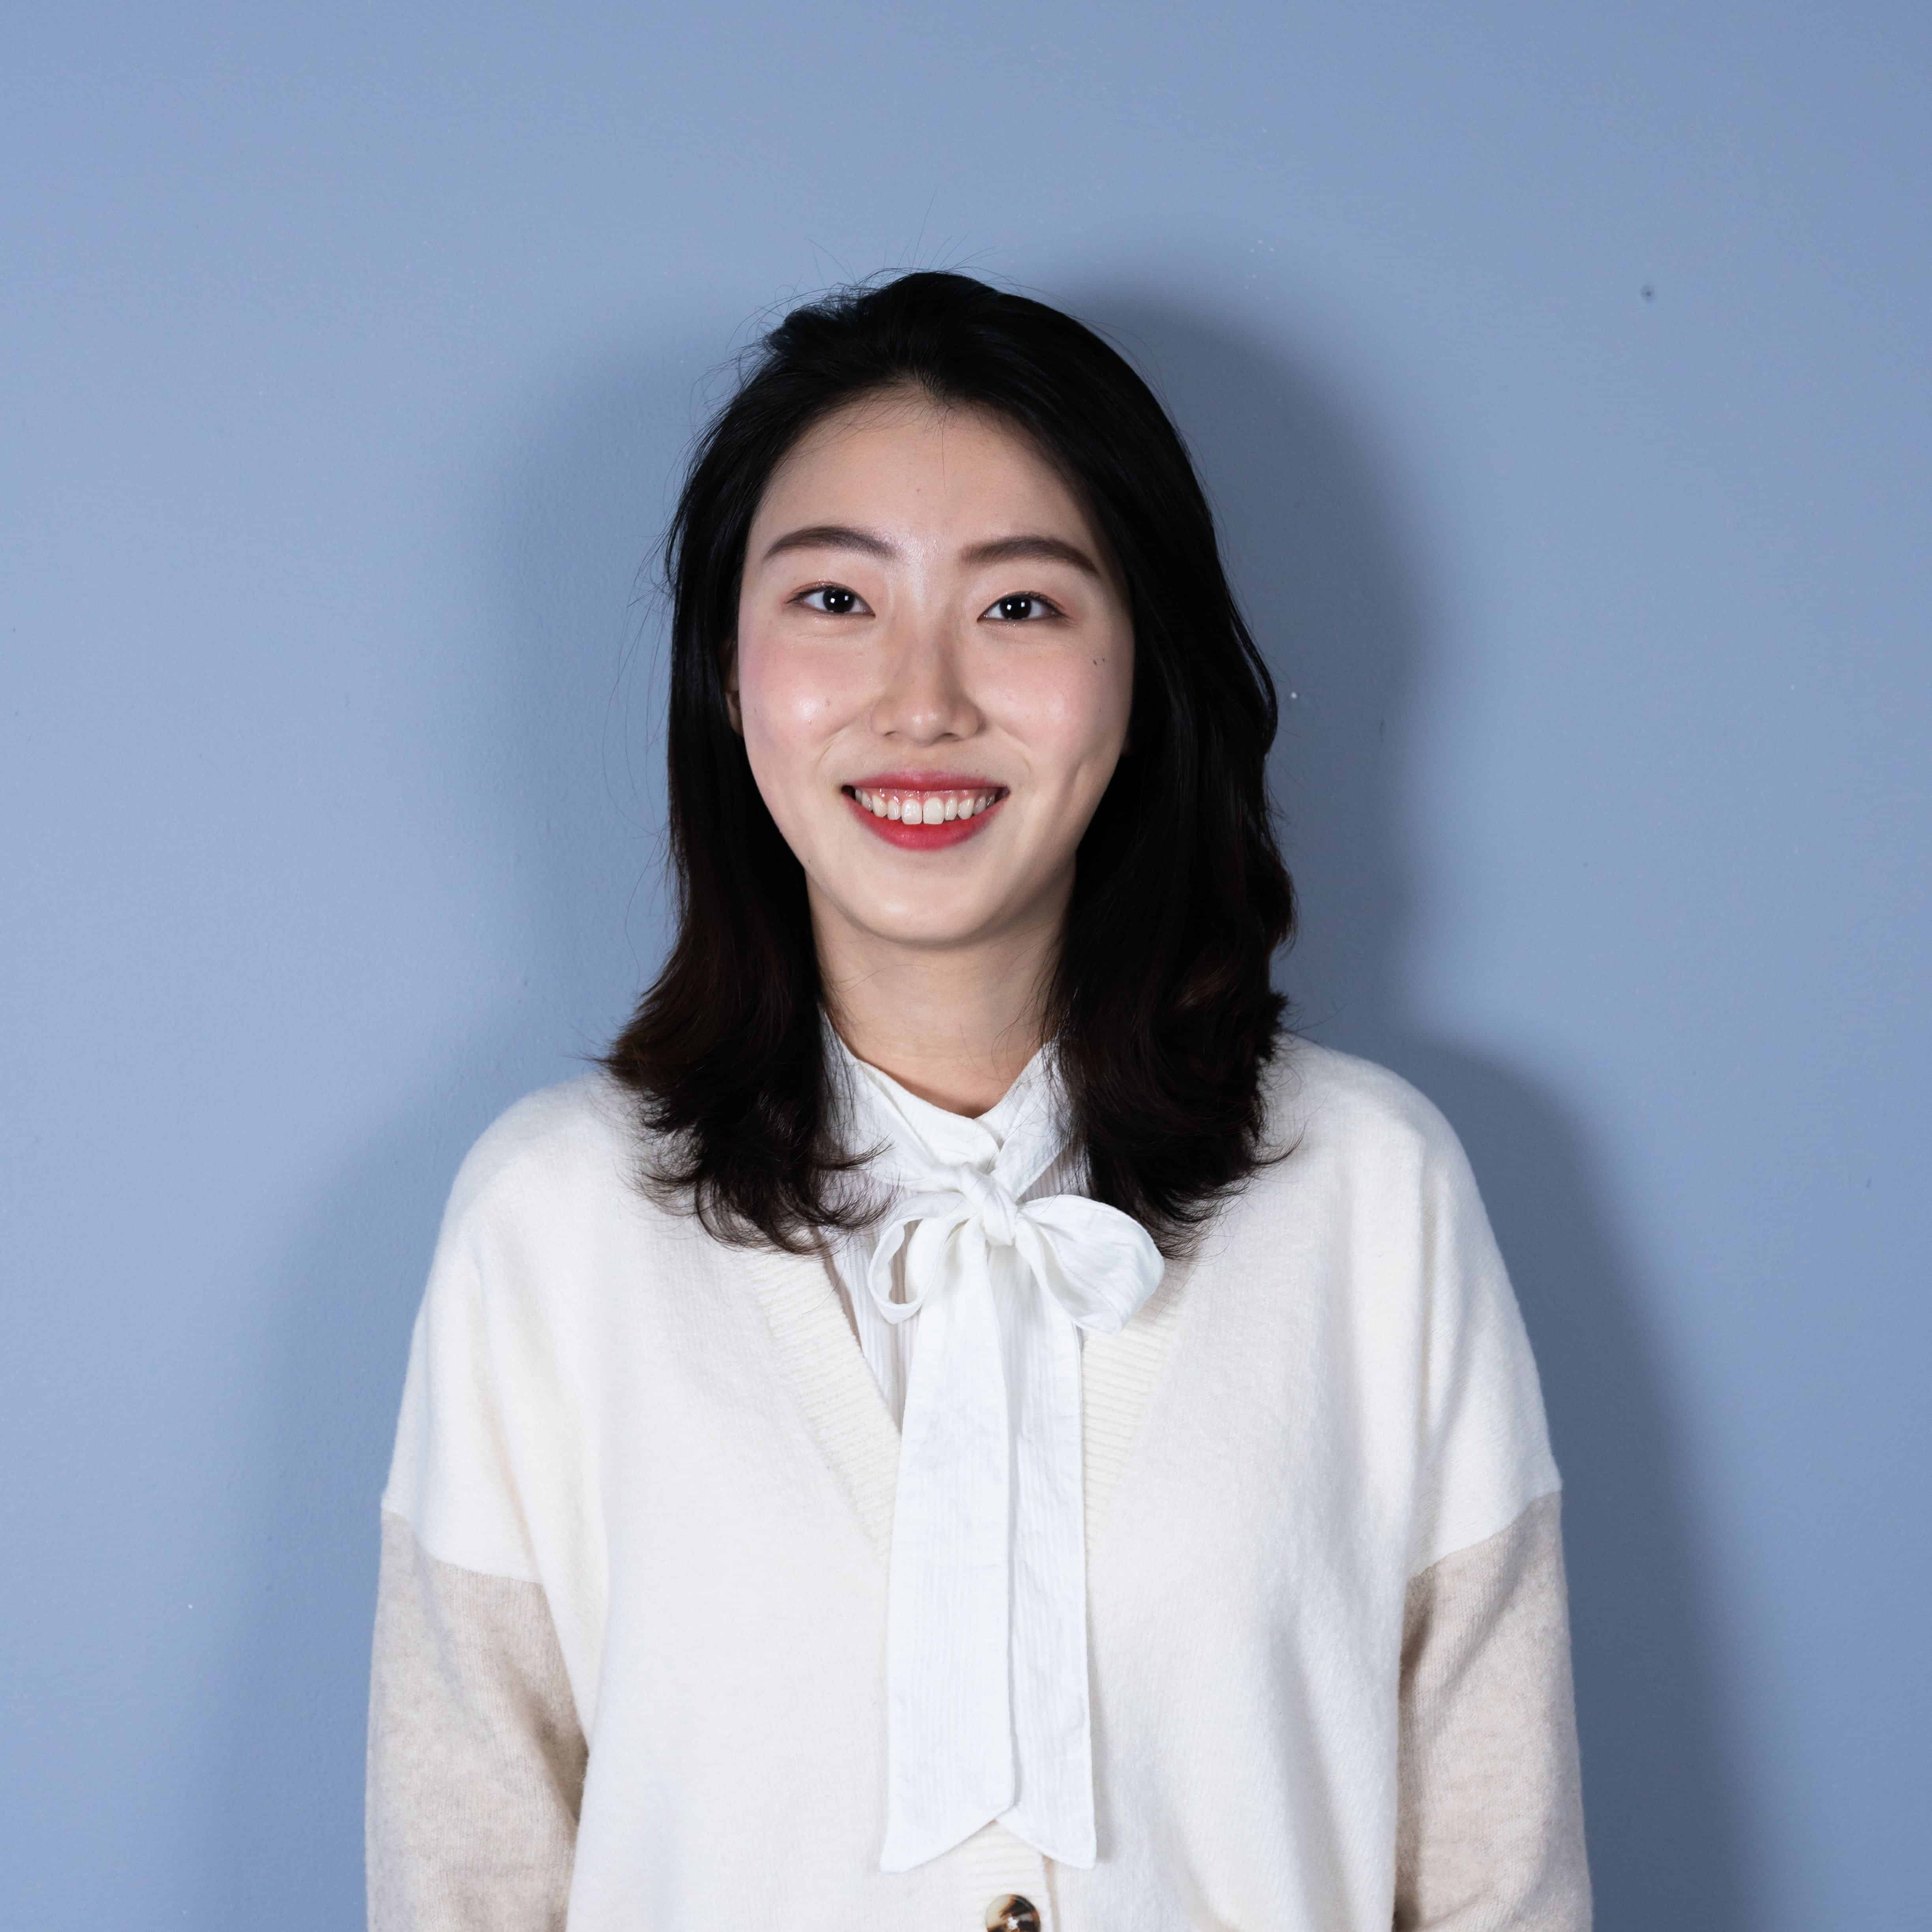 黄芊 Qian Huang